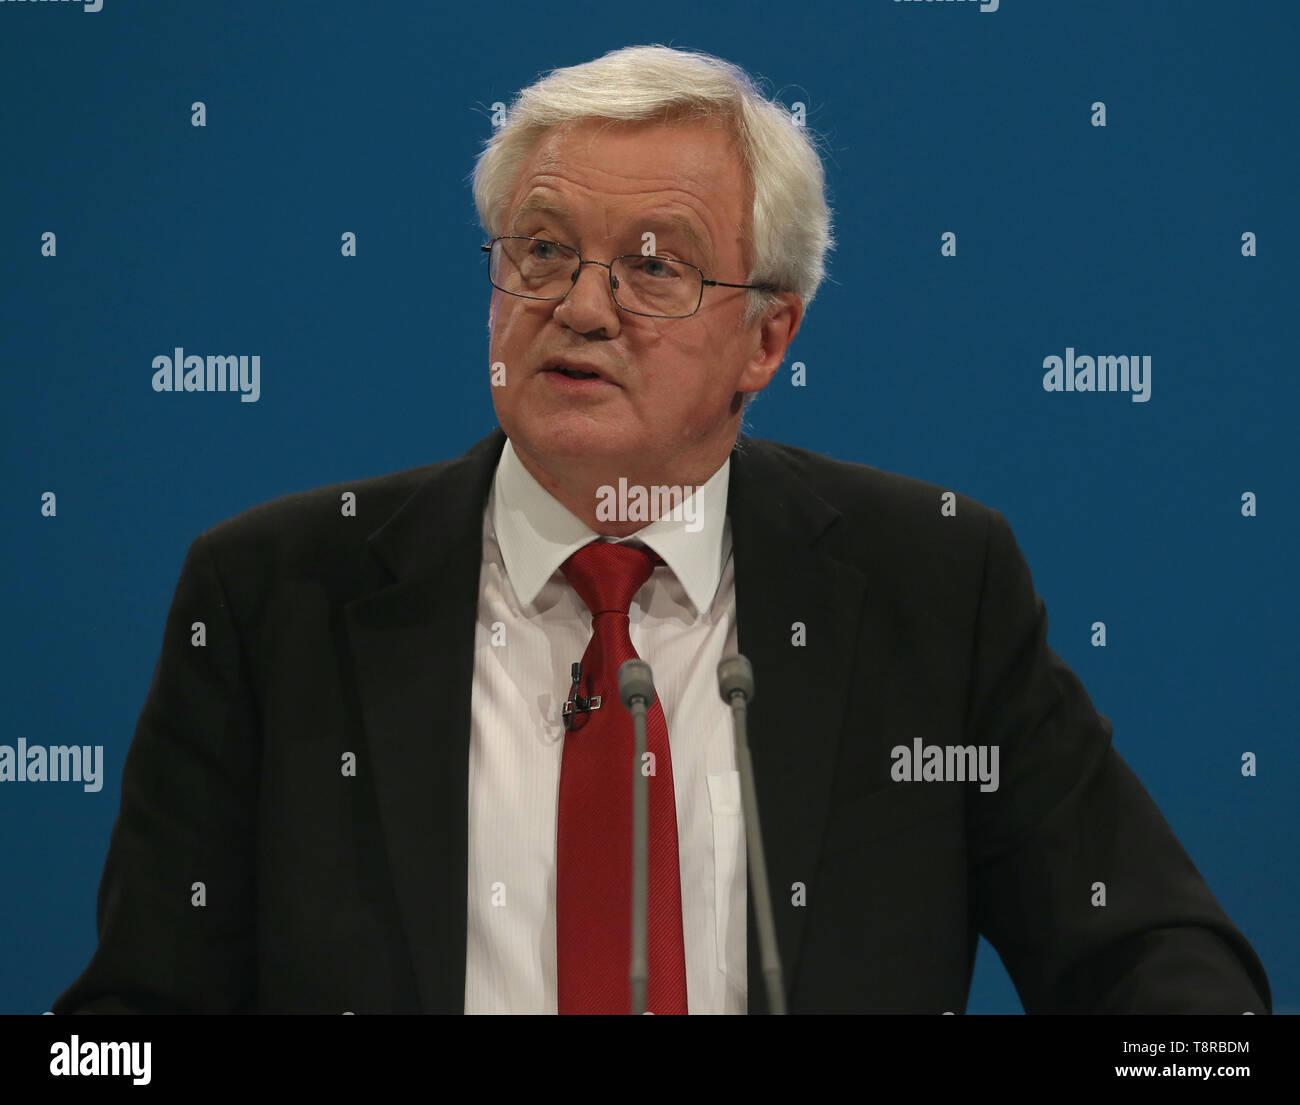 DAVID DAVIS MP, 2017 Immagini Stock